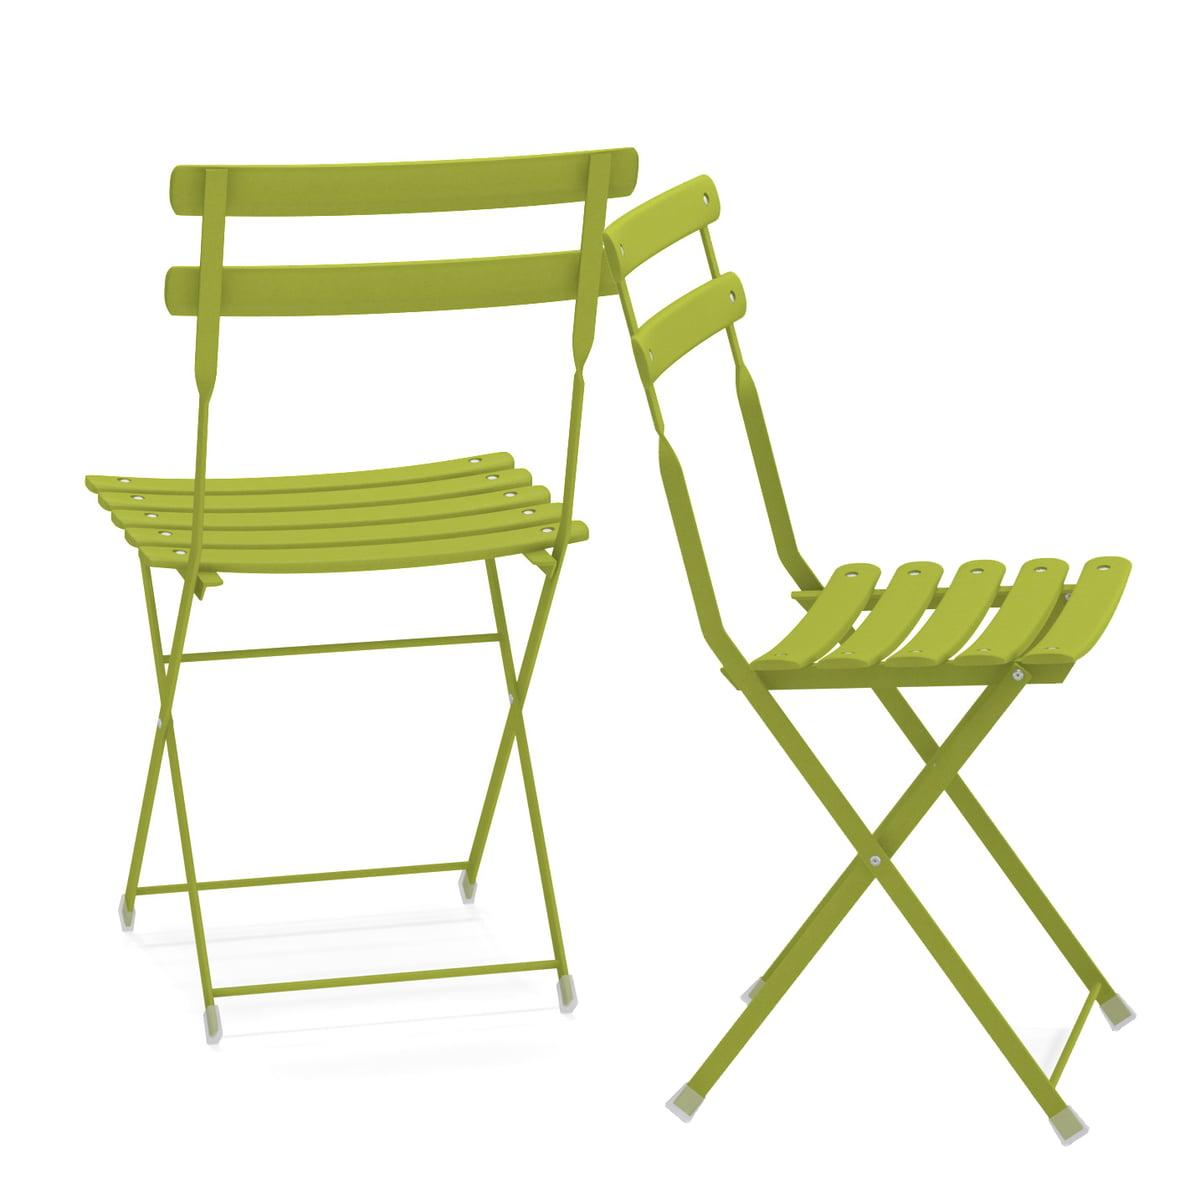 Marvelous Emu Arc En Ciel Folding Chair Antique Iron Squirreltailoven Fun Painted Chair Ideas Images Squirreltailovenorg